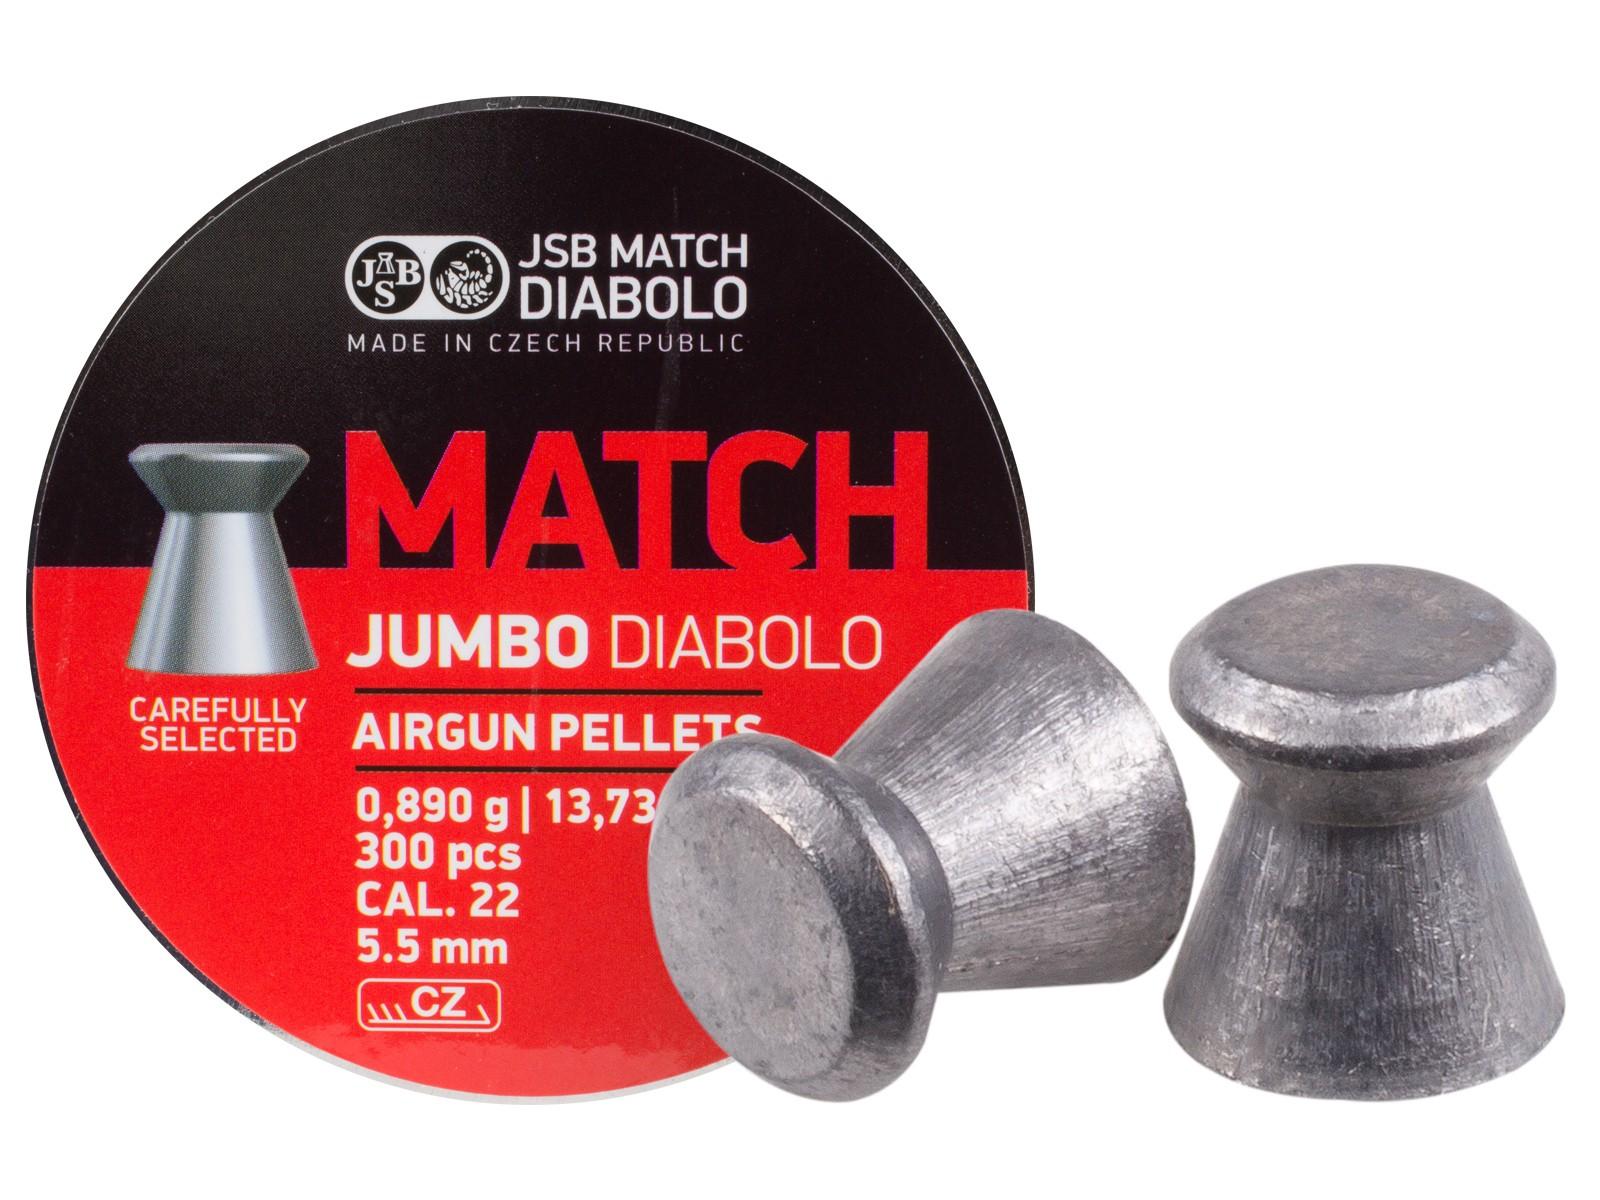 JSB Match Jumbo Diabolo Pellets, .22 Cal, 13.73 Grains, Wadcutter, 300ct